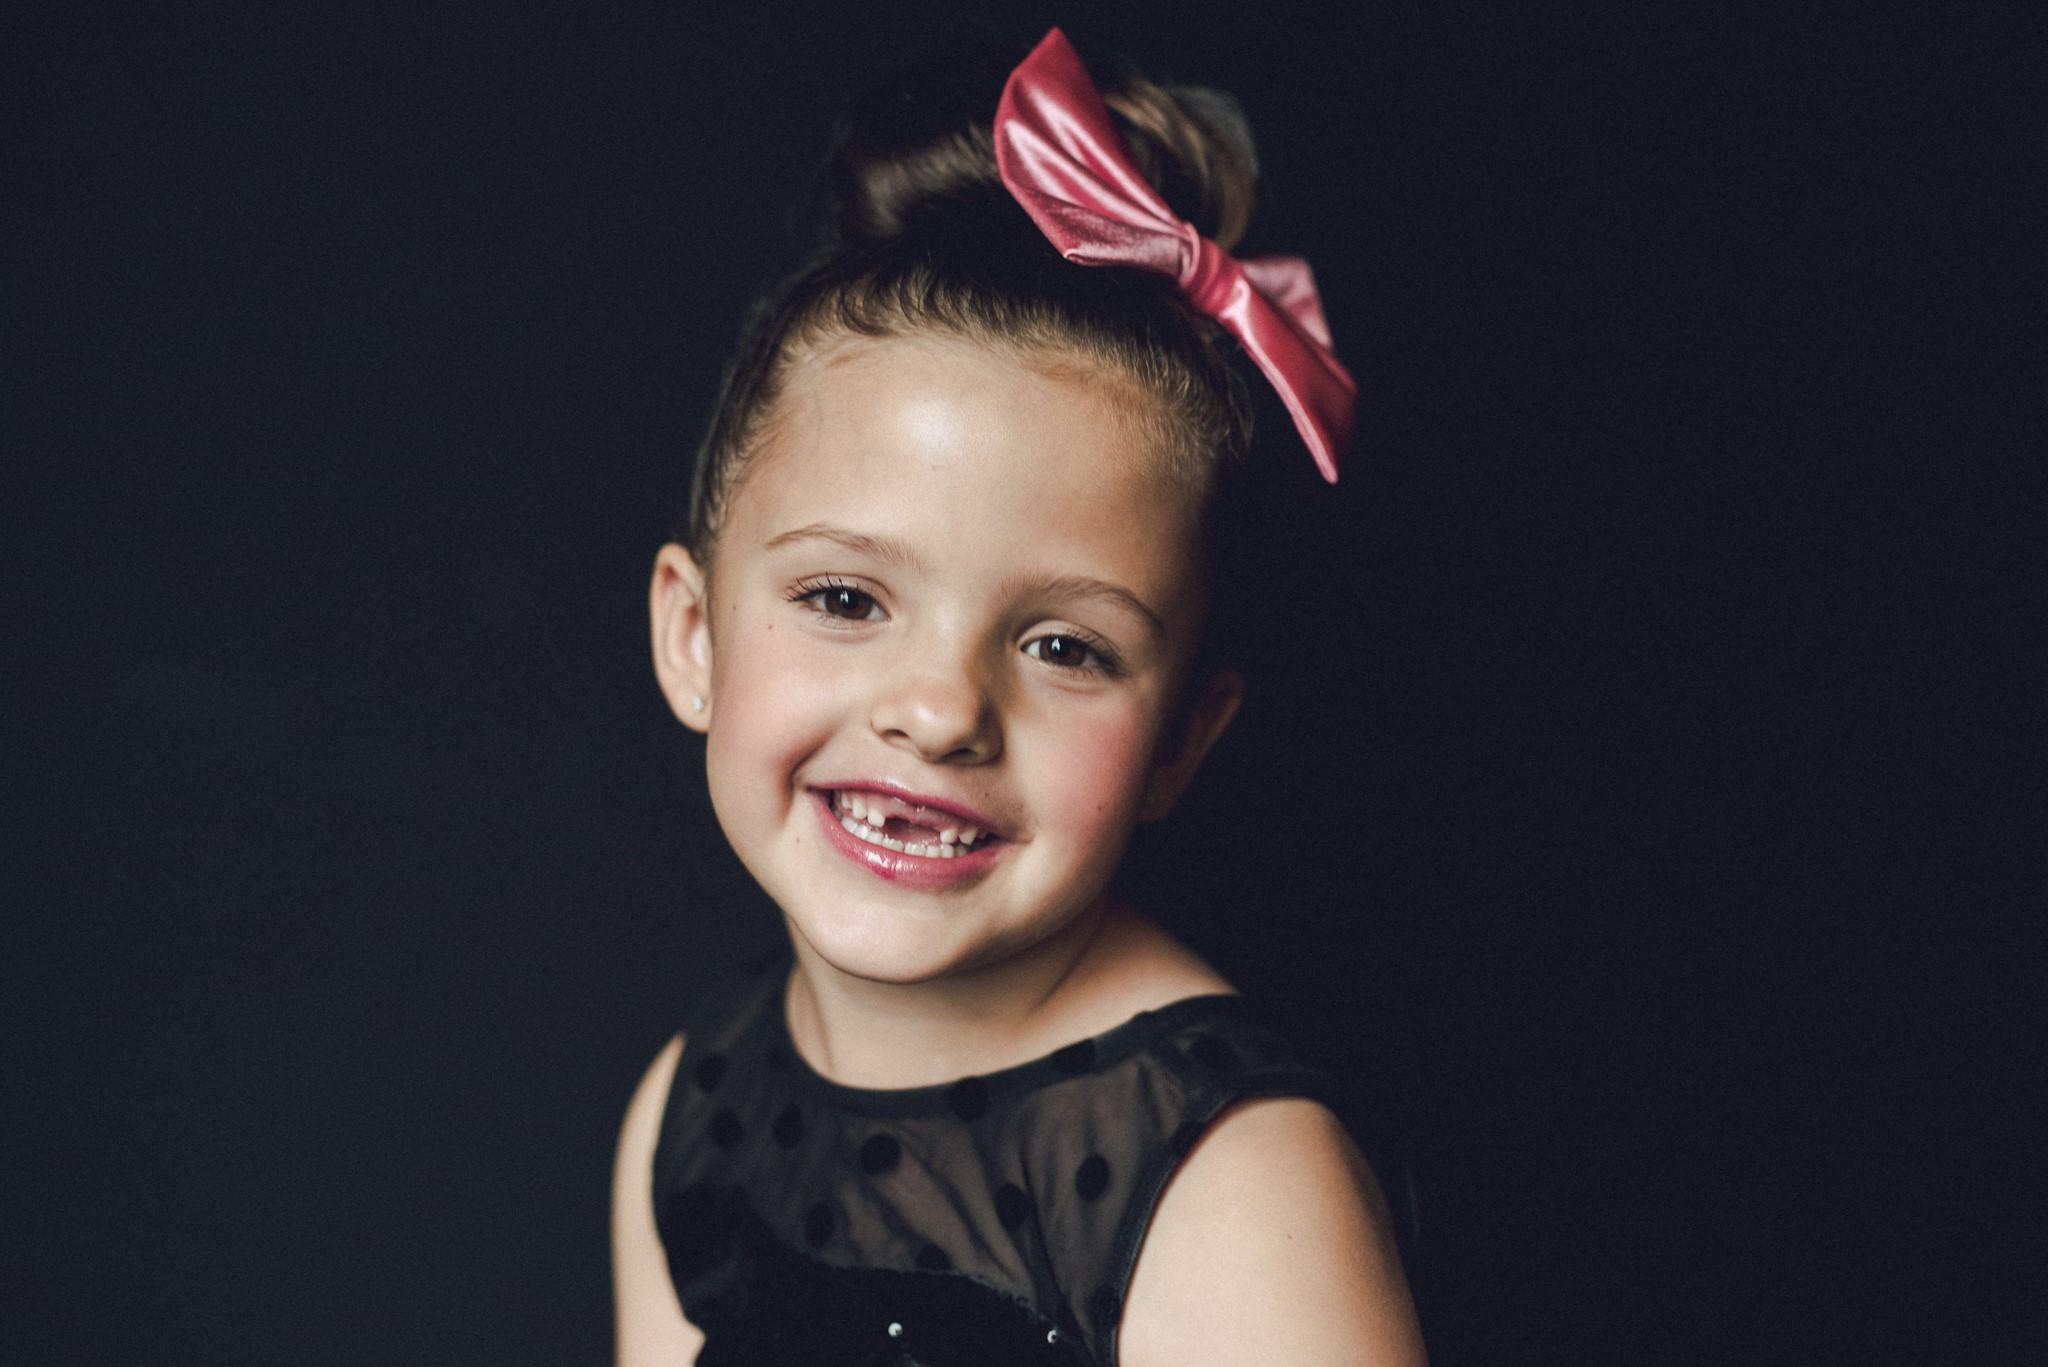 schooled online fine art child school portrait photography monica glover